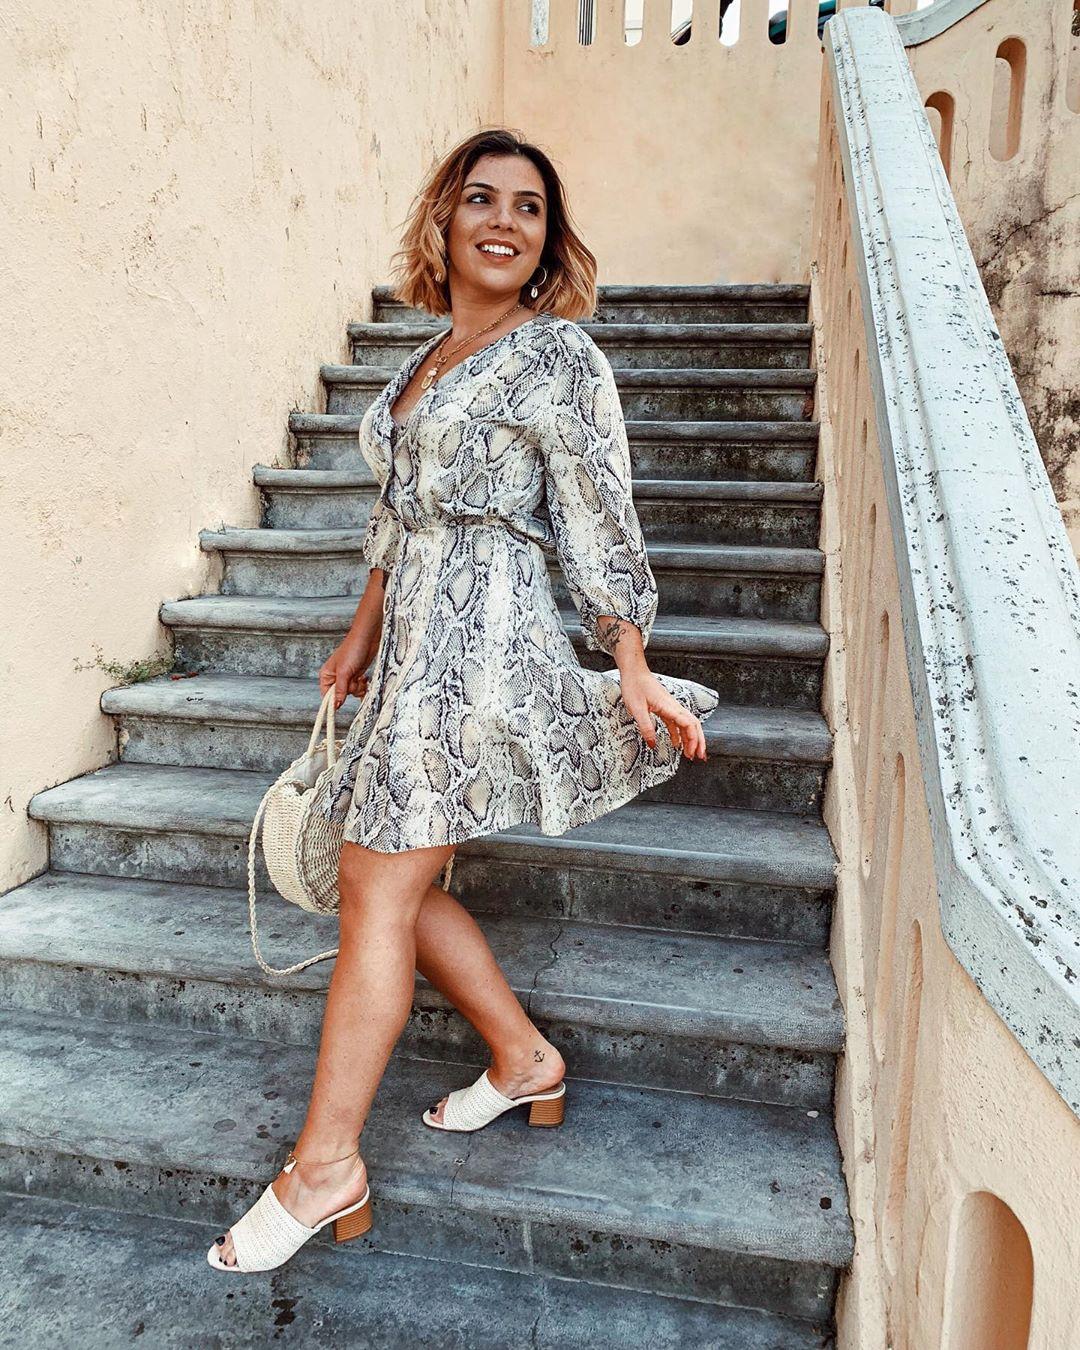 animal print dress de Zara sur susanabatalha03